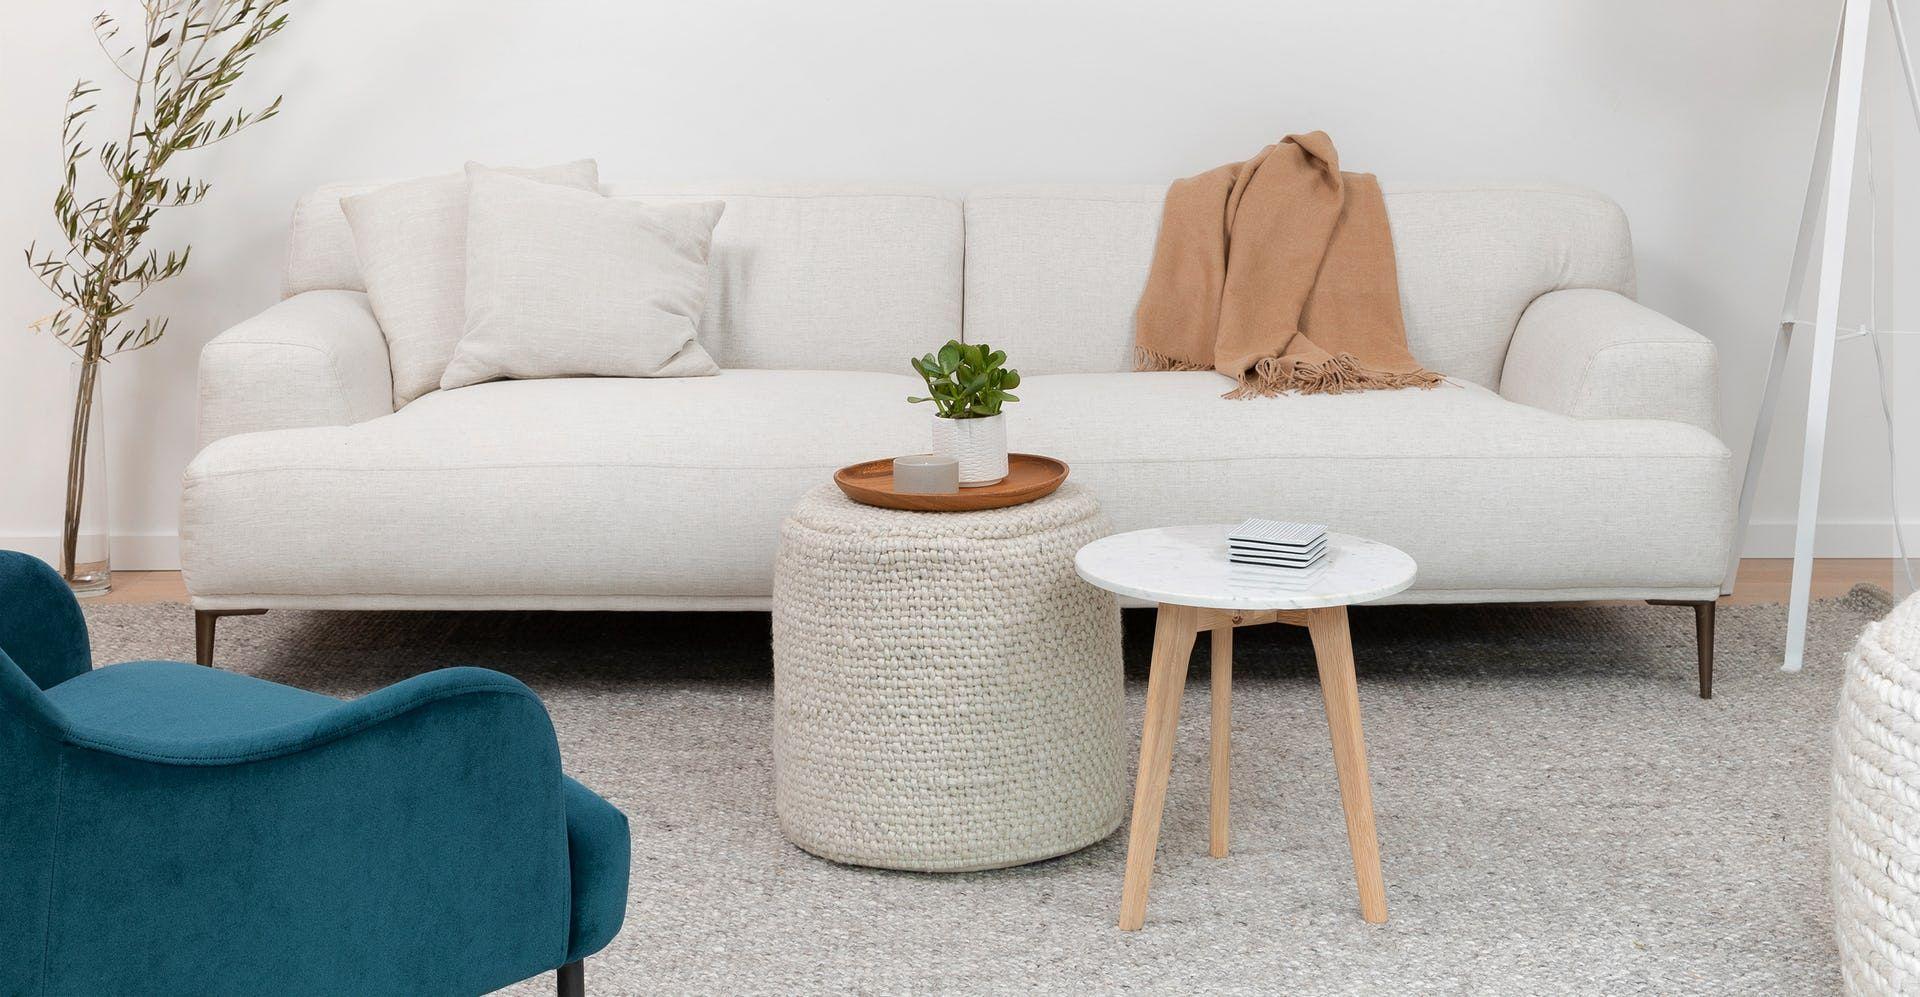 Abisko Quartz White Sofa Dream House Ideas In 2019 Couches